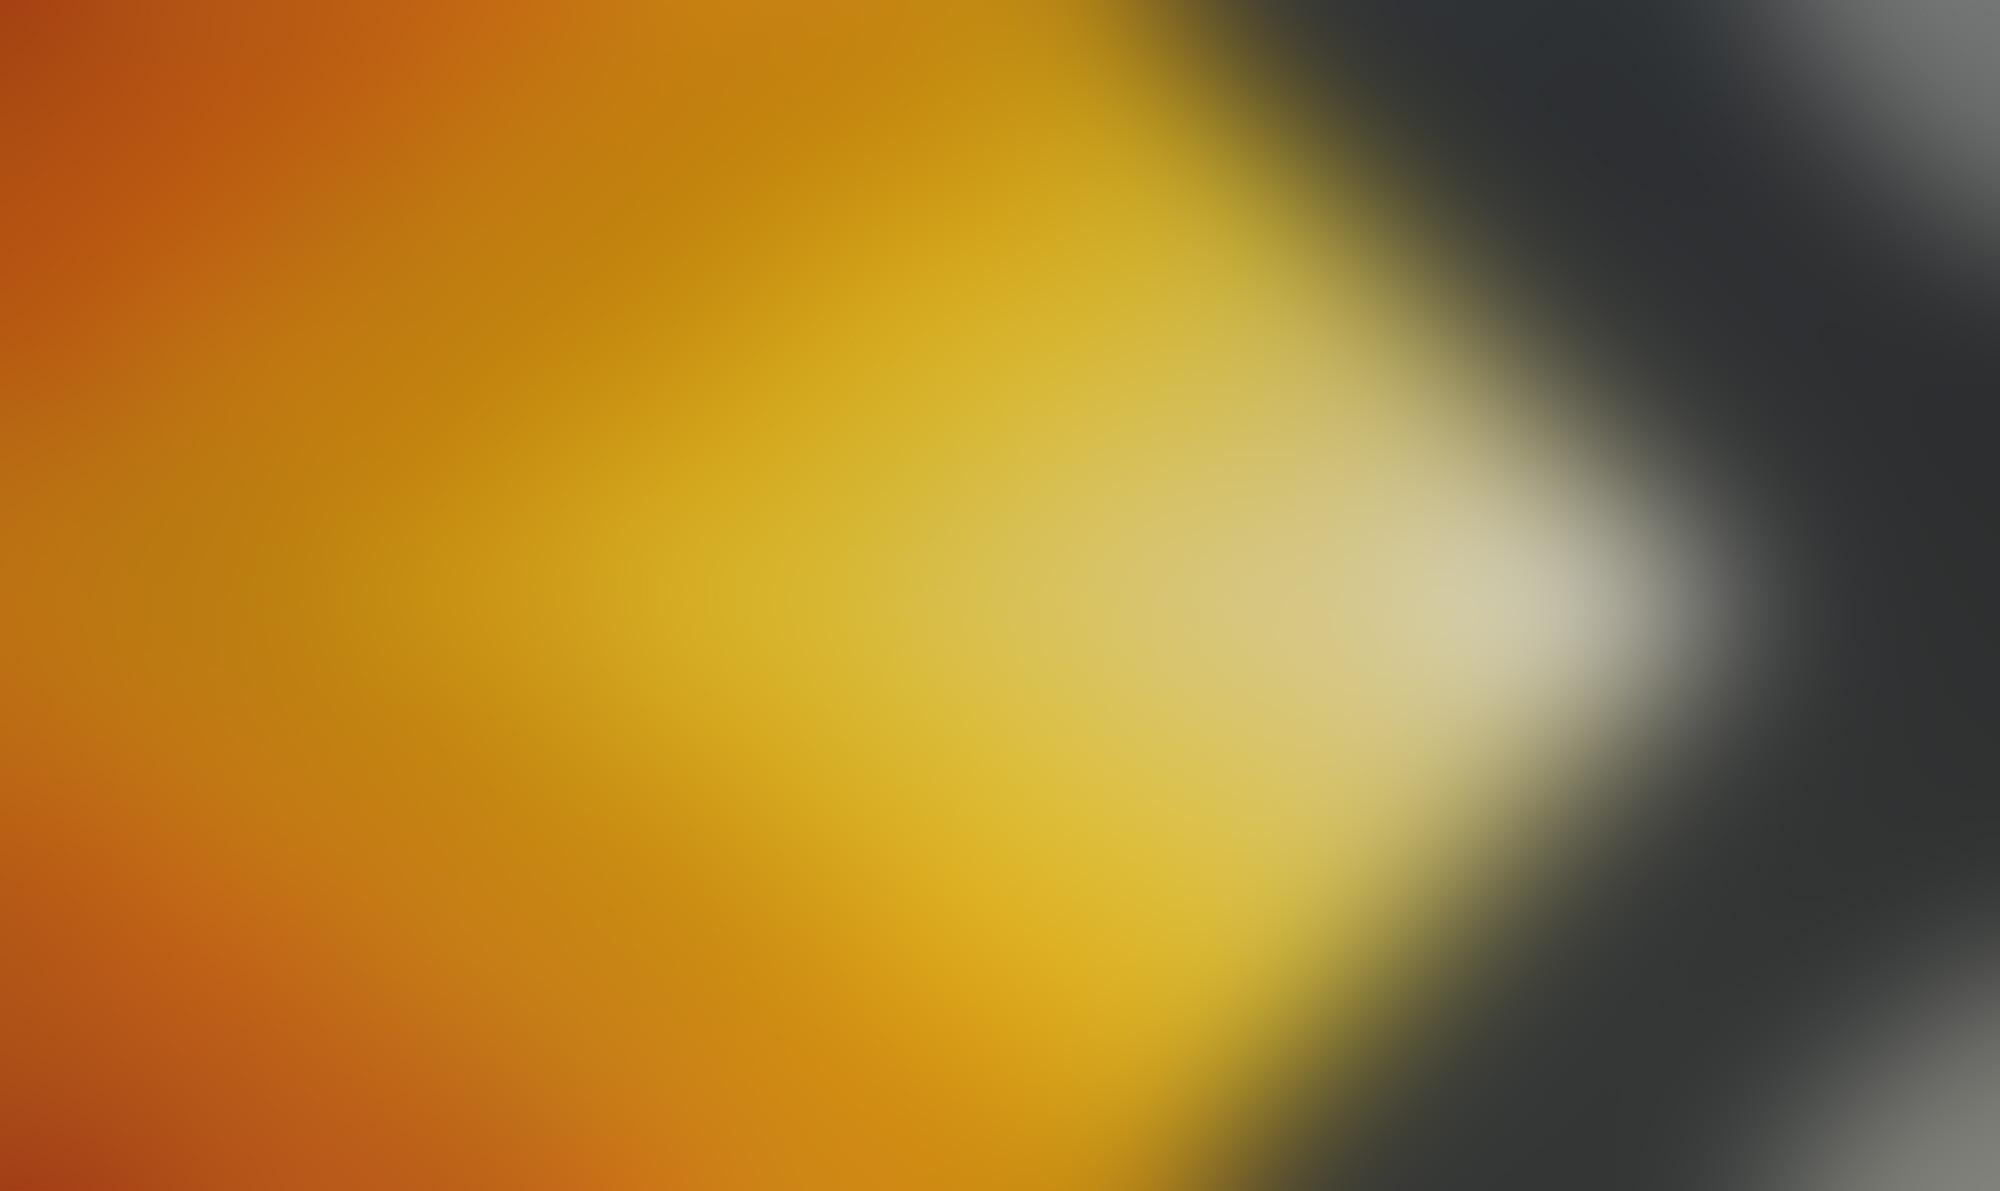 Arrow image - movement - transition - blur.jpg